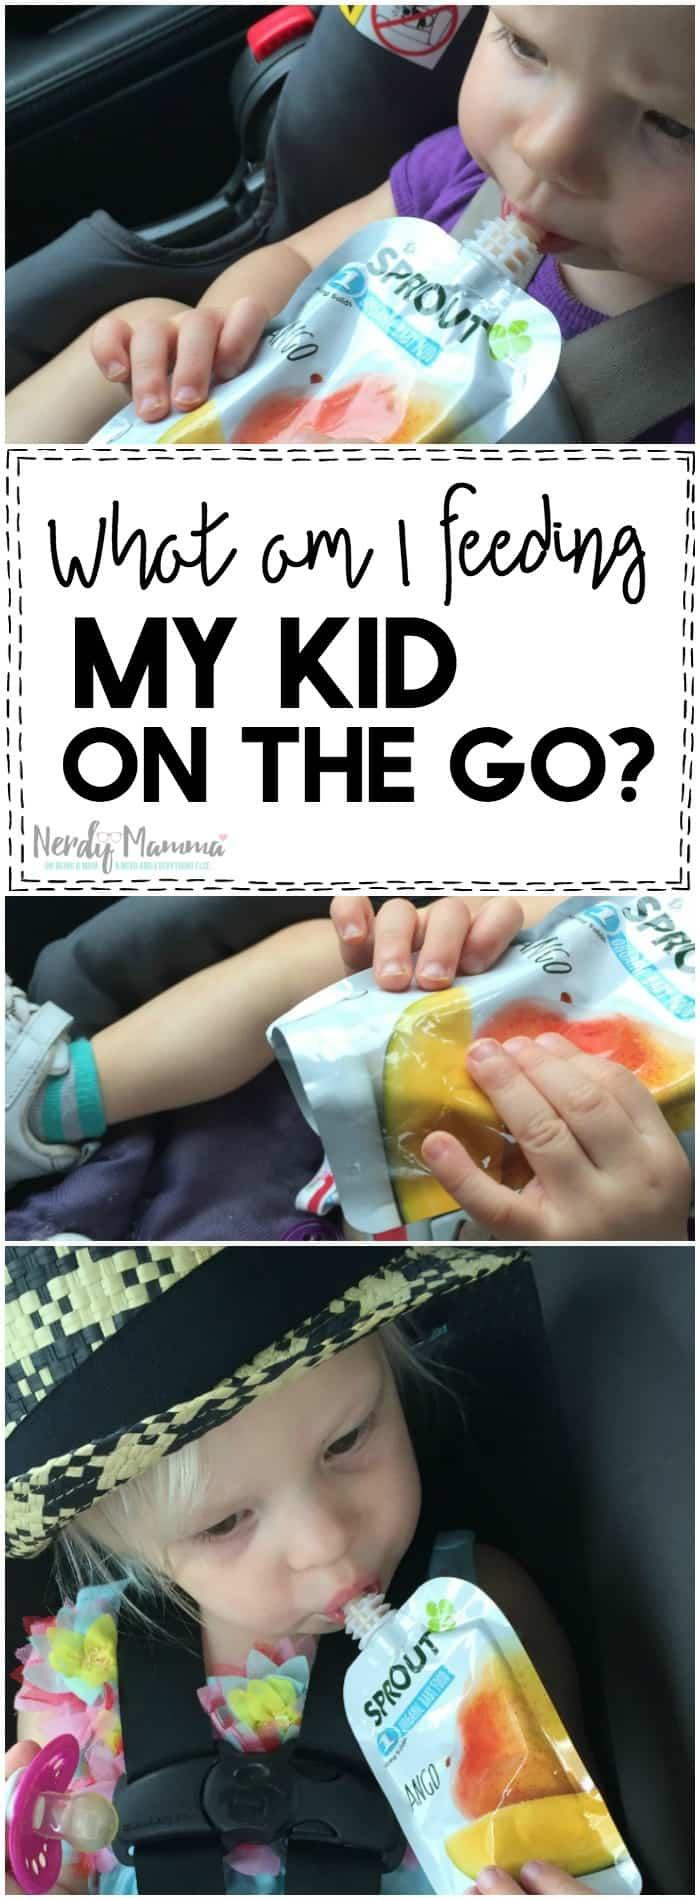 I love this mom's thoughts on what am I really feeding my kid on the go. She's so right! I had no idea.